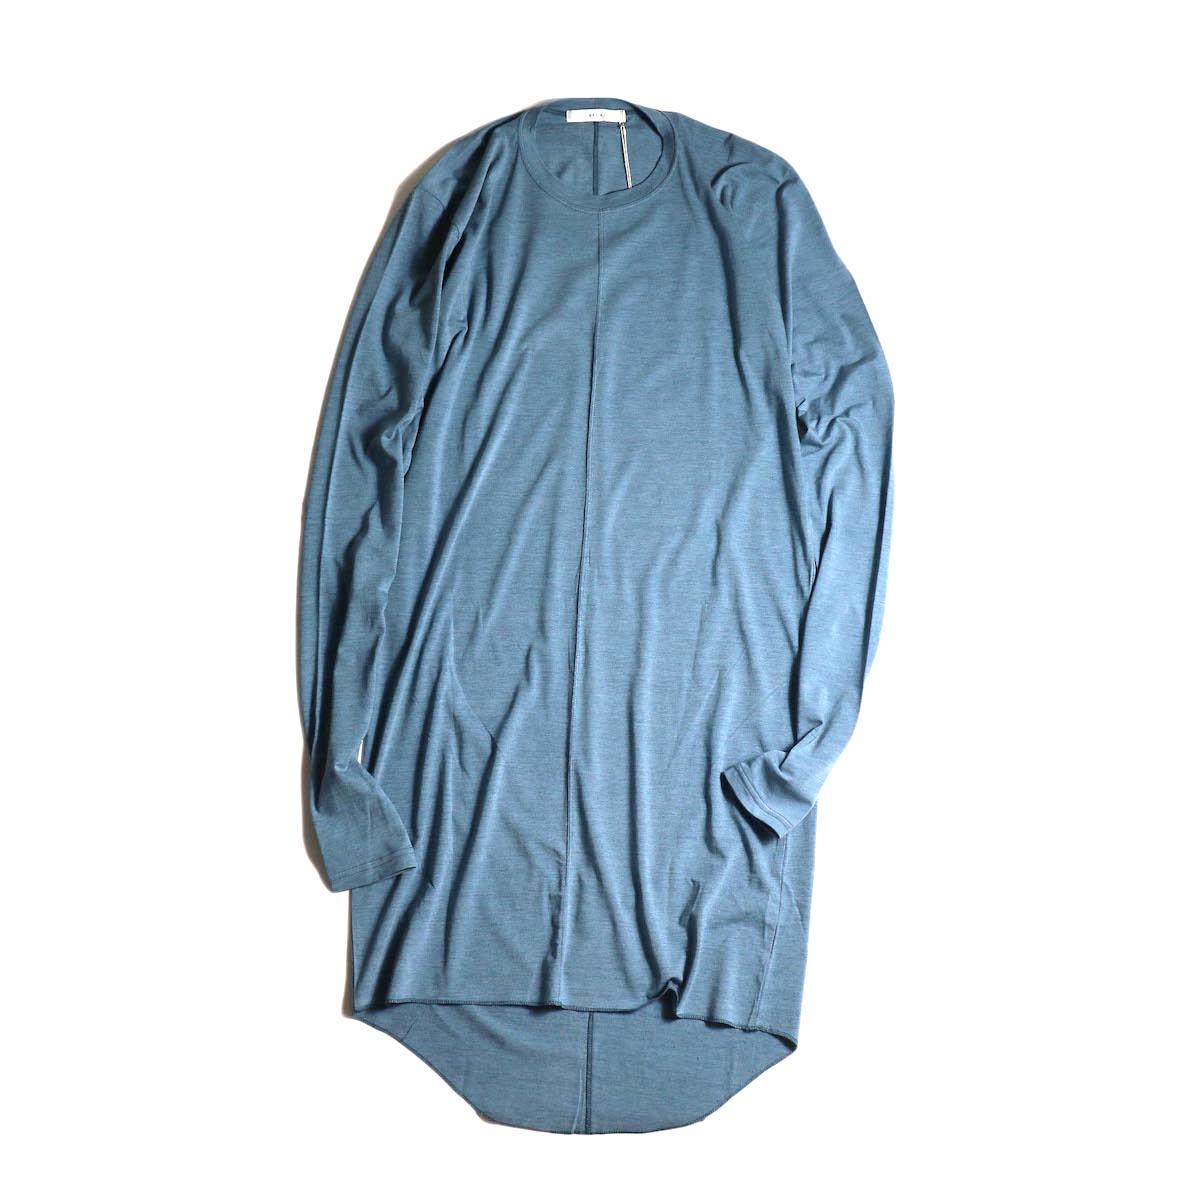 ARCHI / ABELIA ONEPIECE (blue)